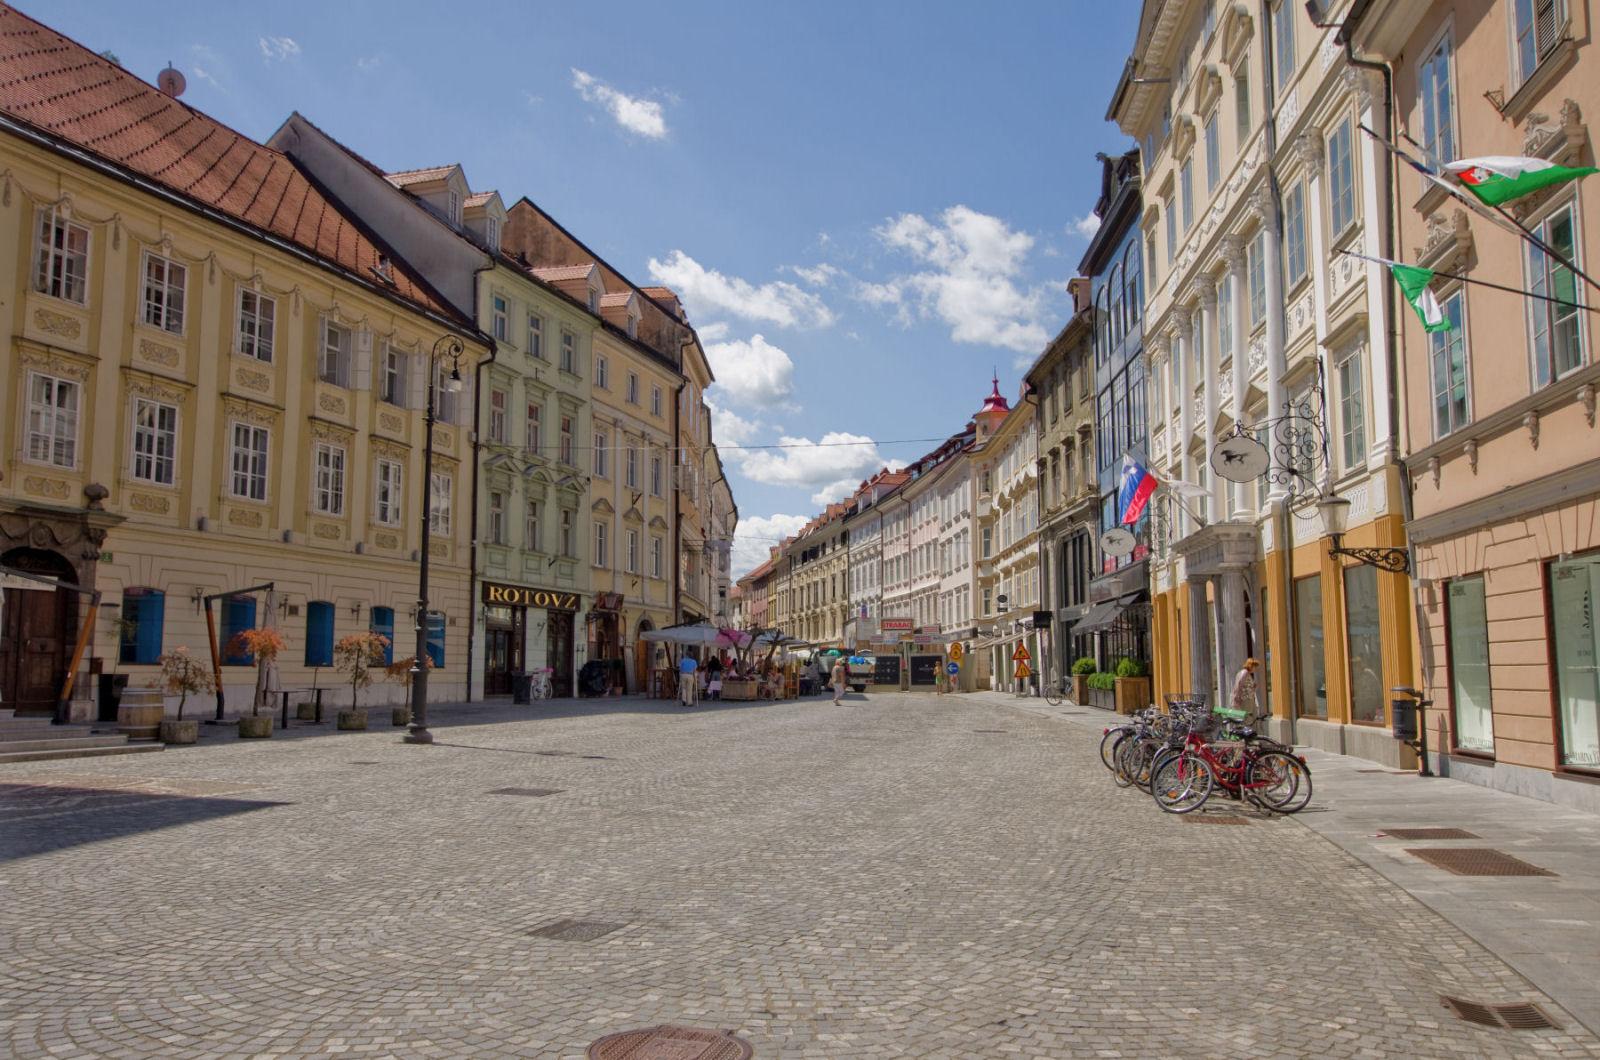 Ljubljana old town streets, Slovenia